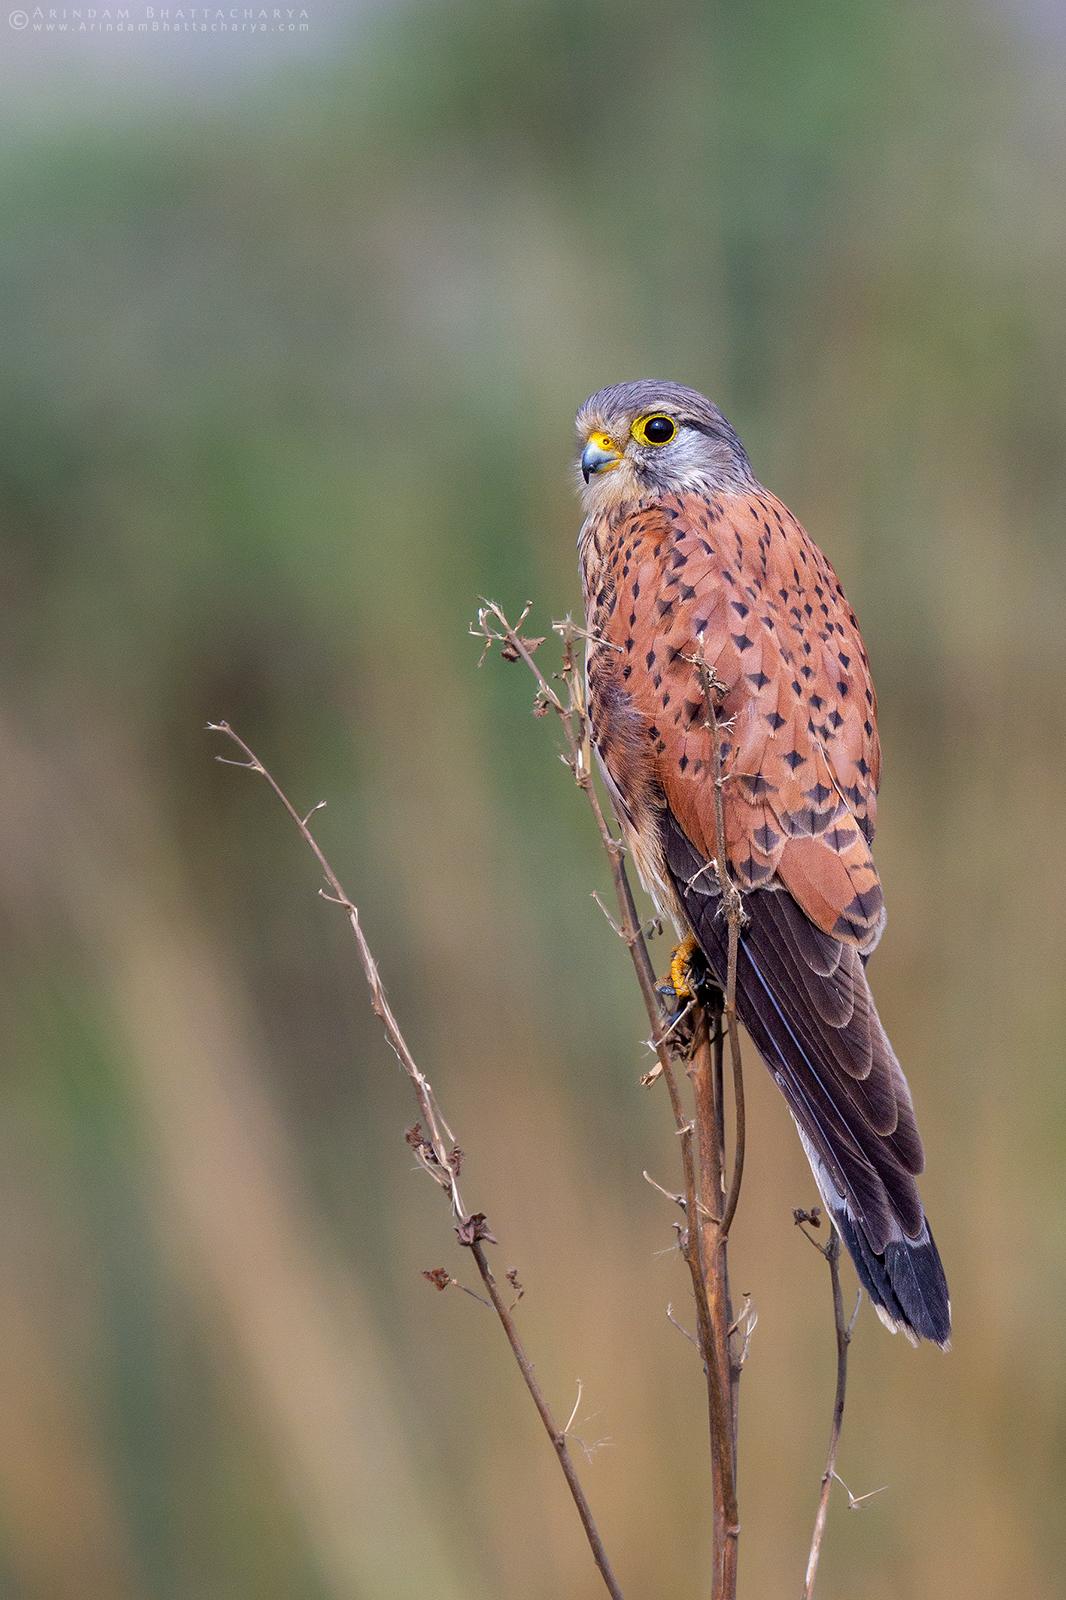 Common Kestral or Falco tinnunculus in Rajarhat grassland Kolkata West Bengal India during winter.